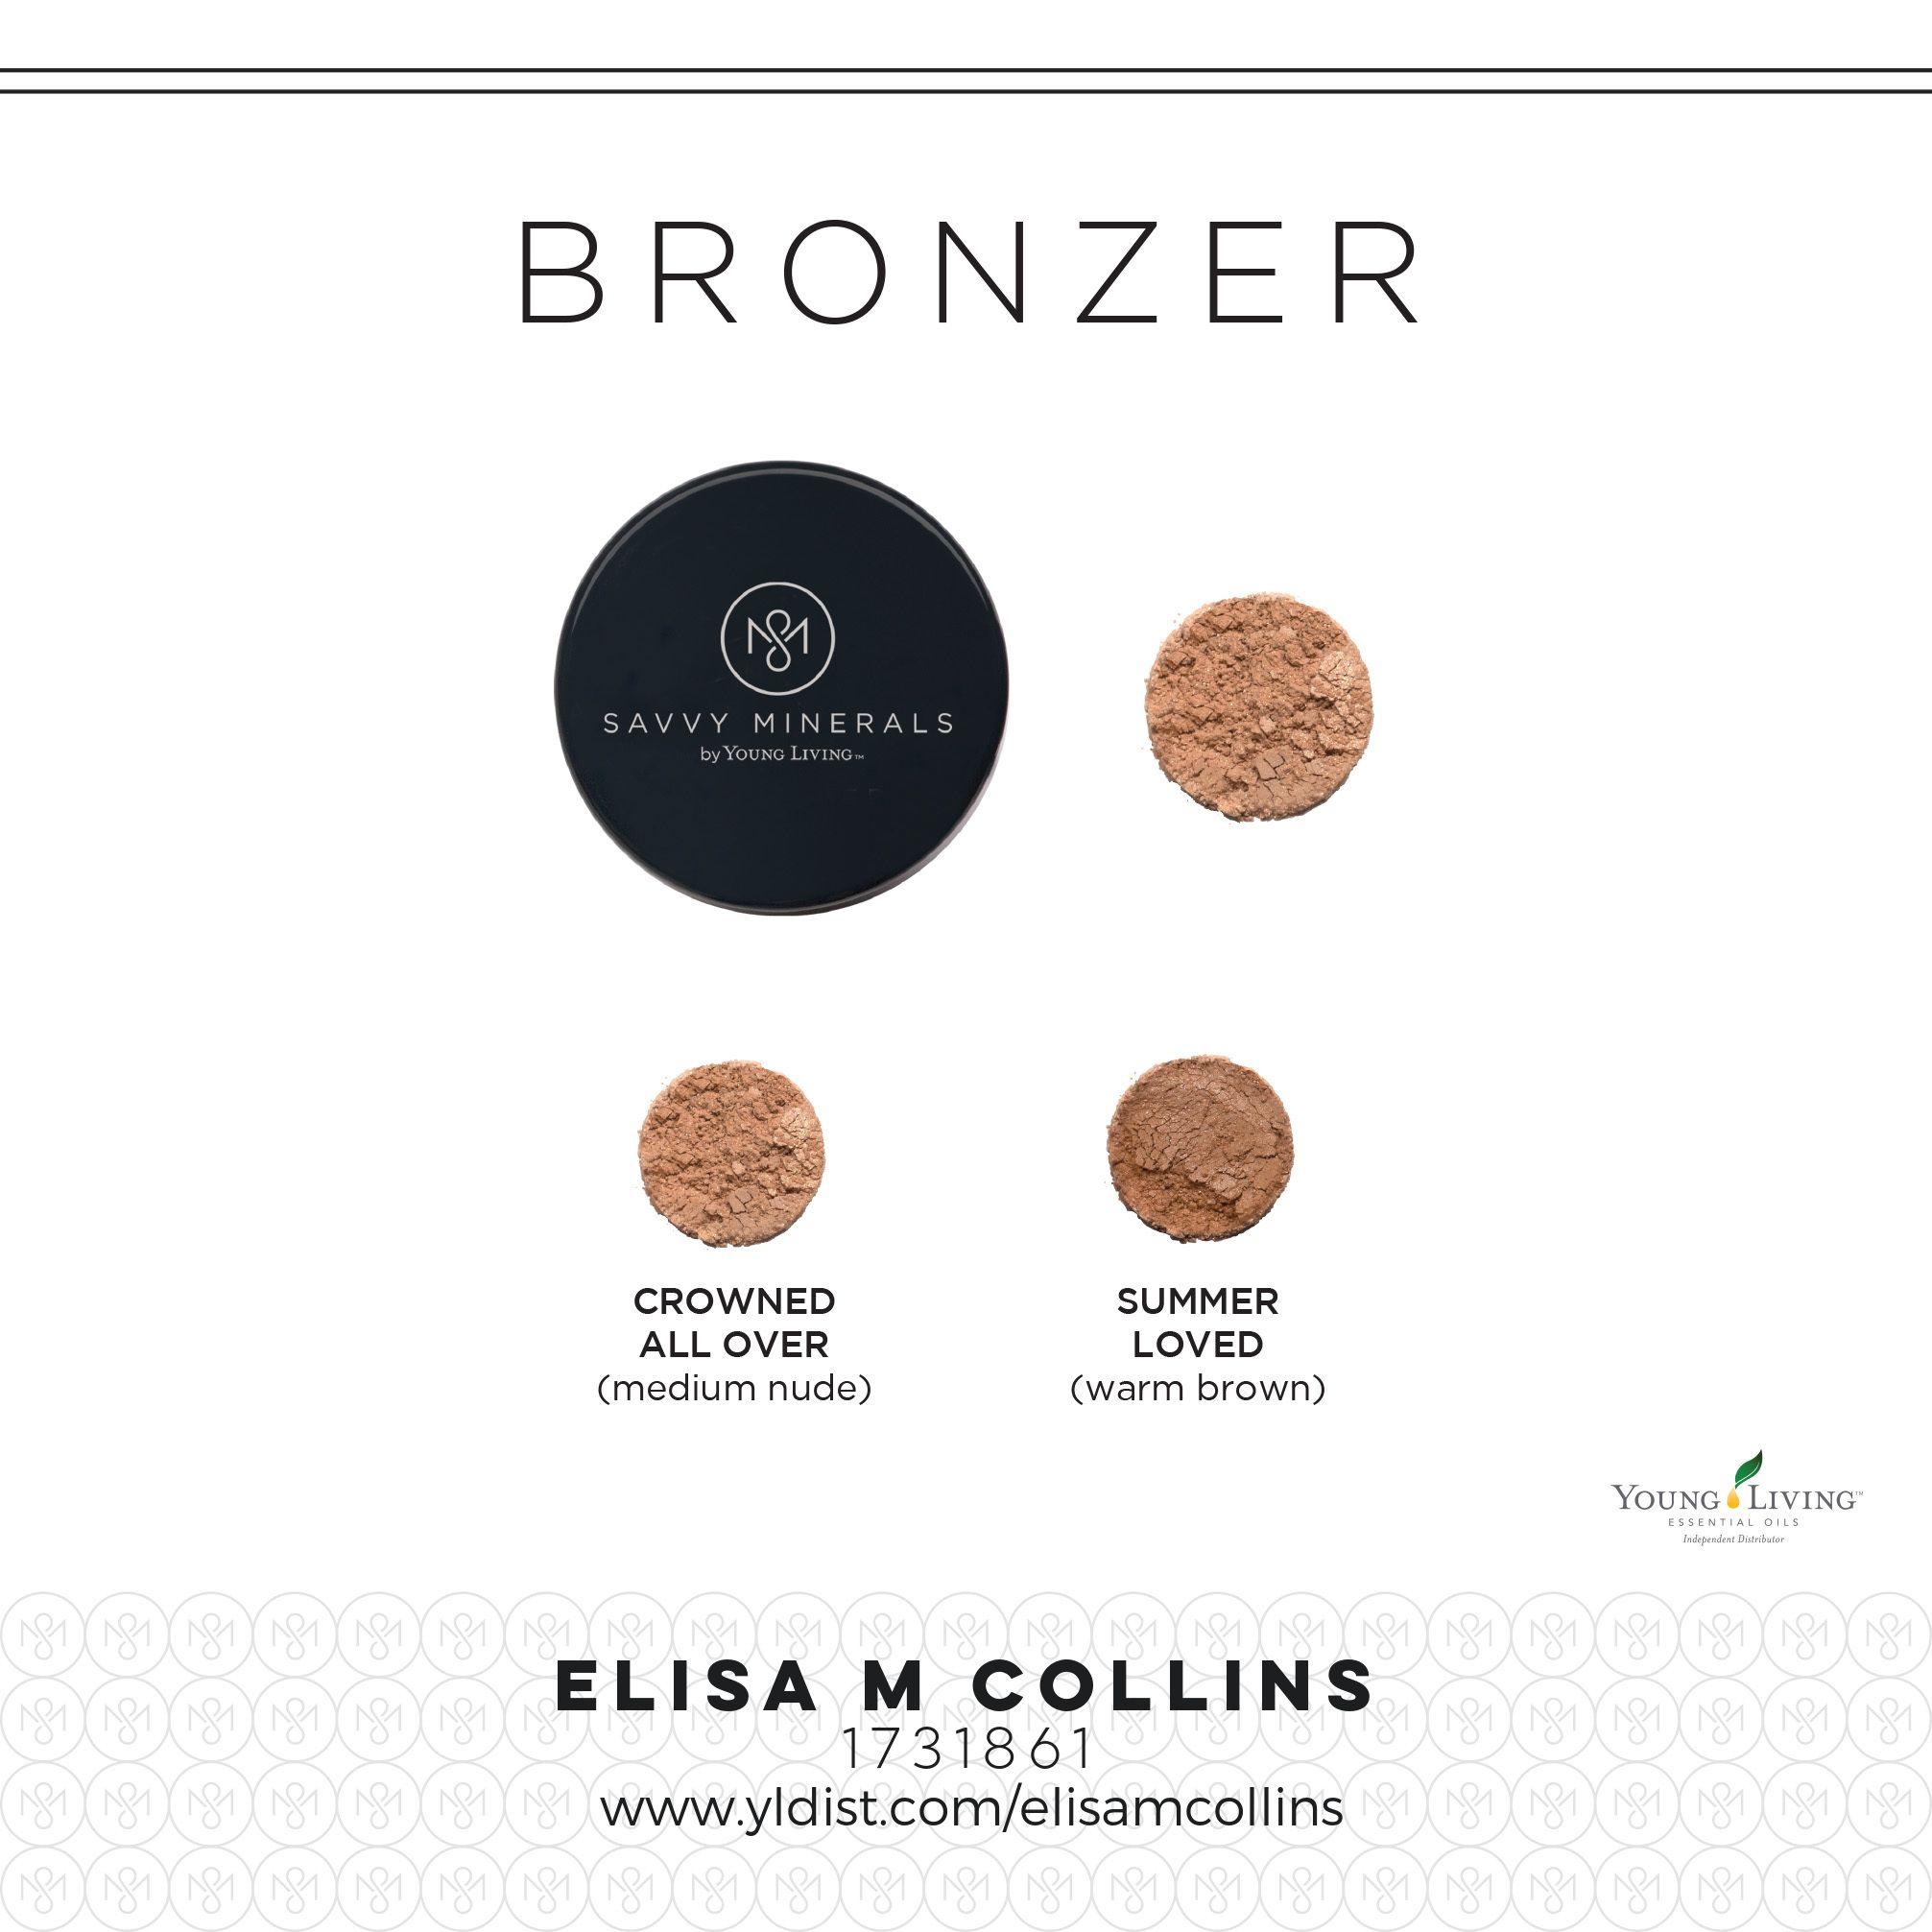 Bronzer selections Savvy minerals, Mineral bronzer